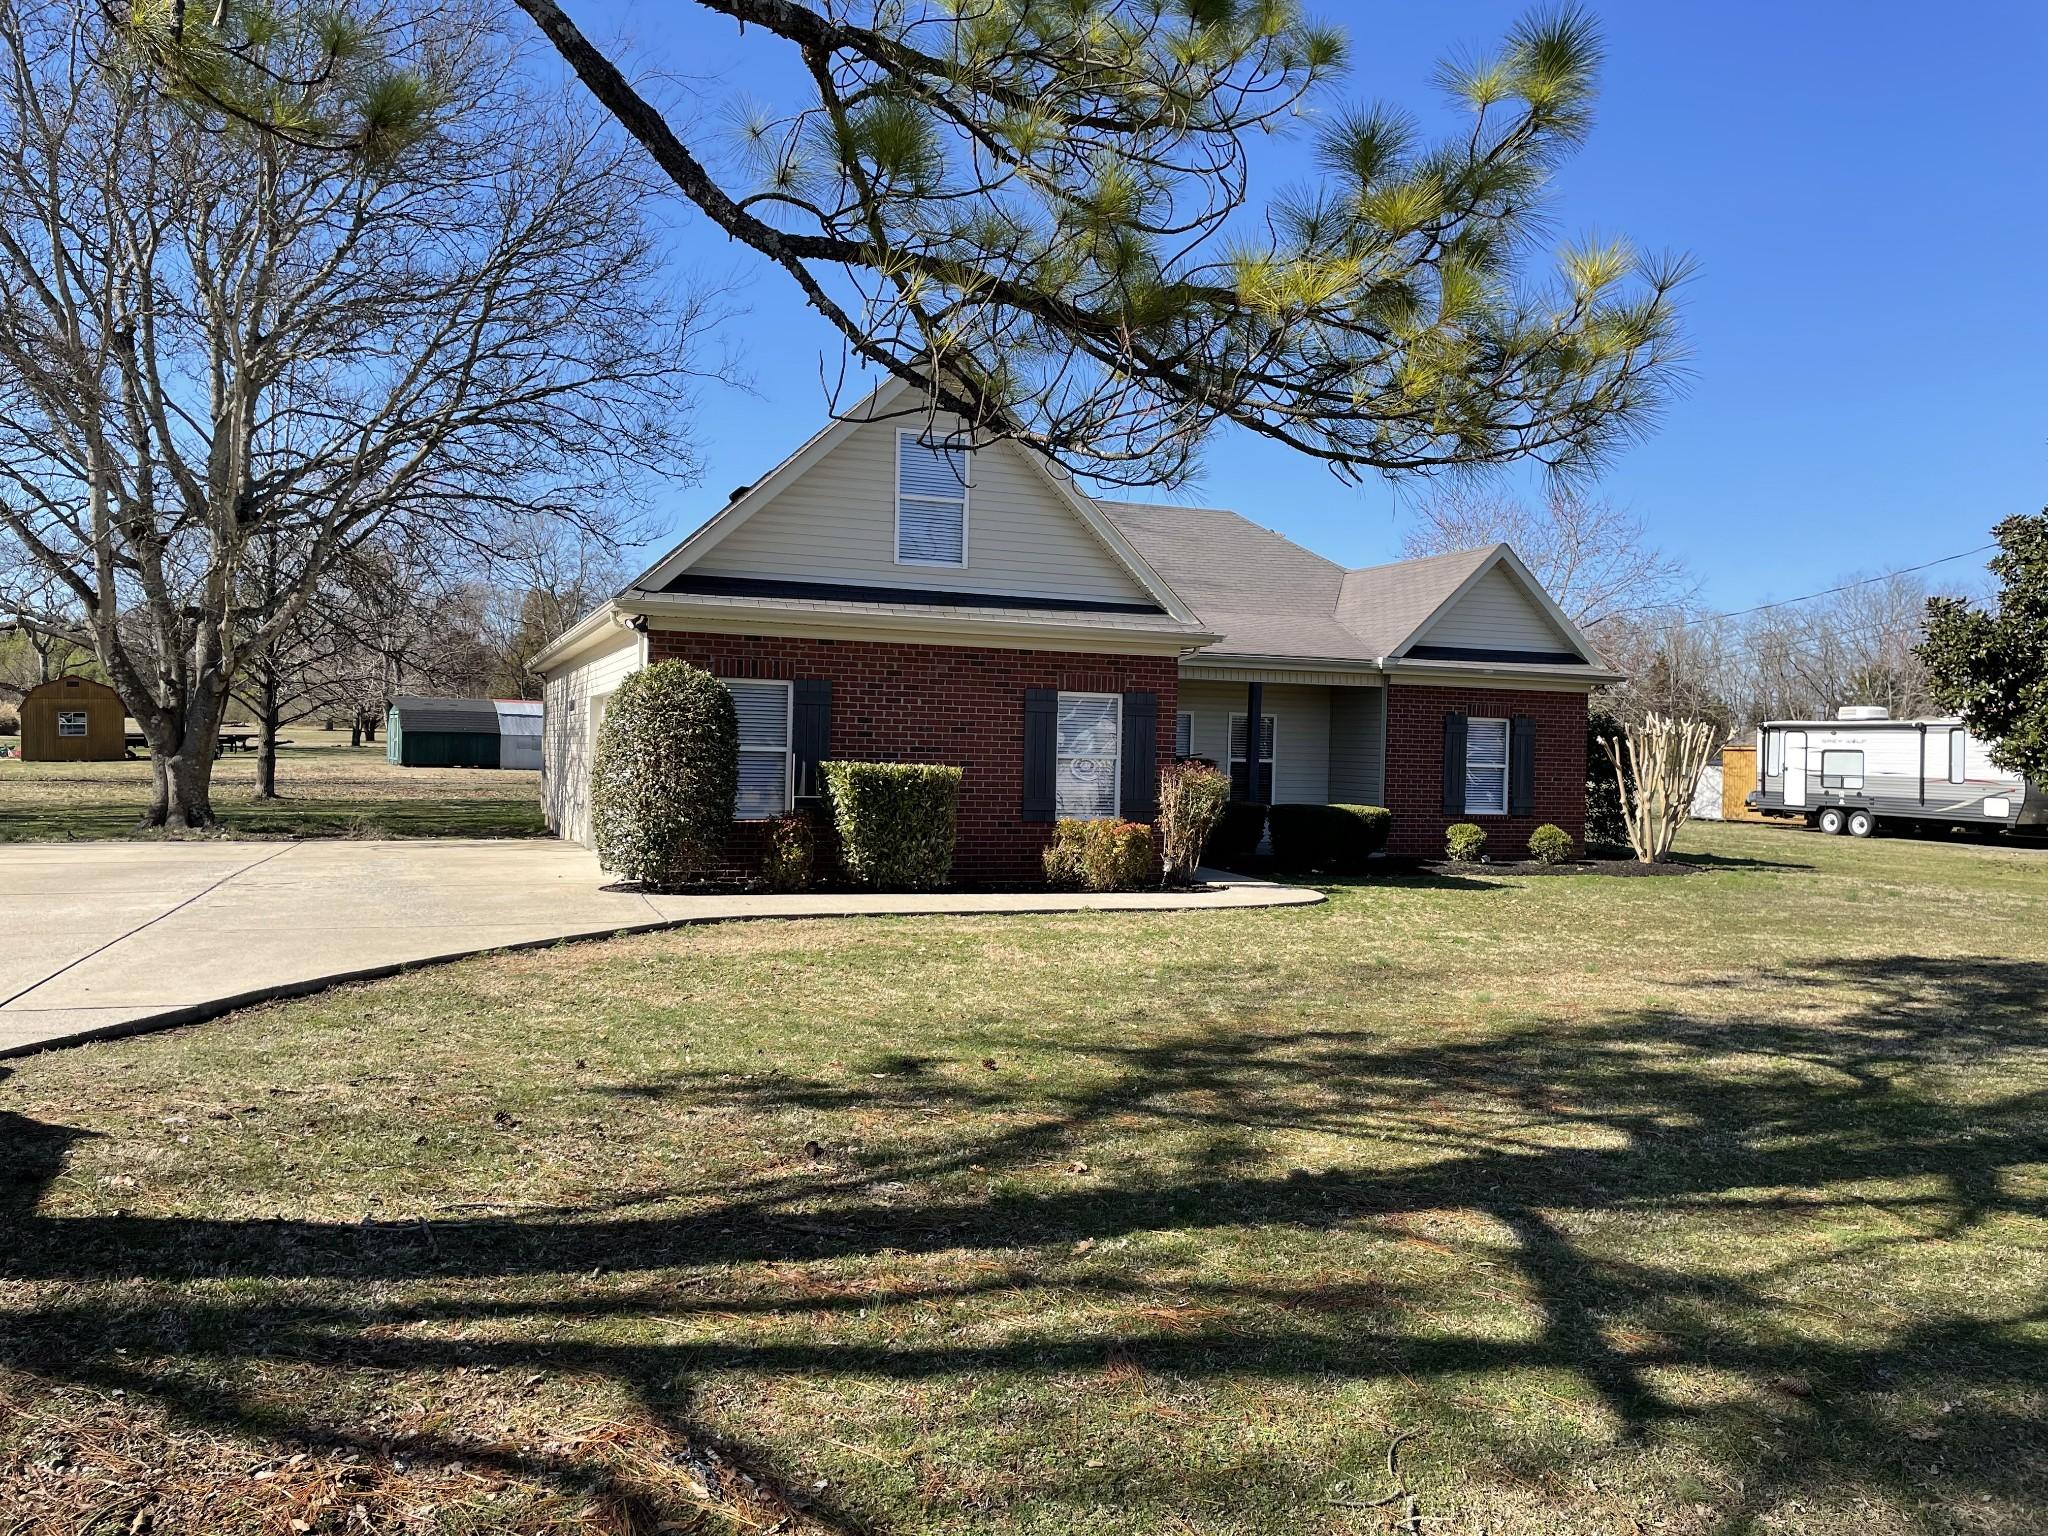 111 Parrish St Property Photo - LA VERGNE, TN real estate listing